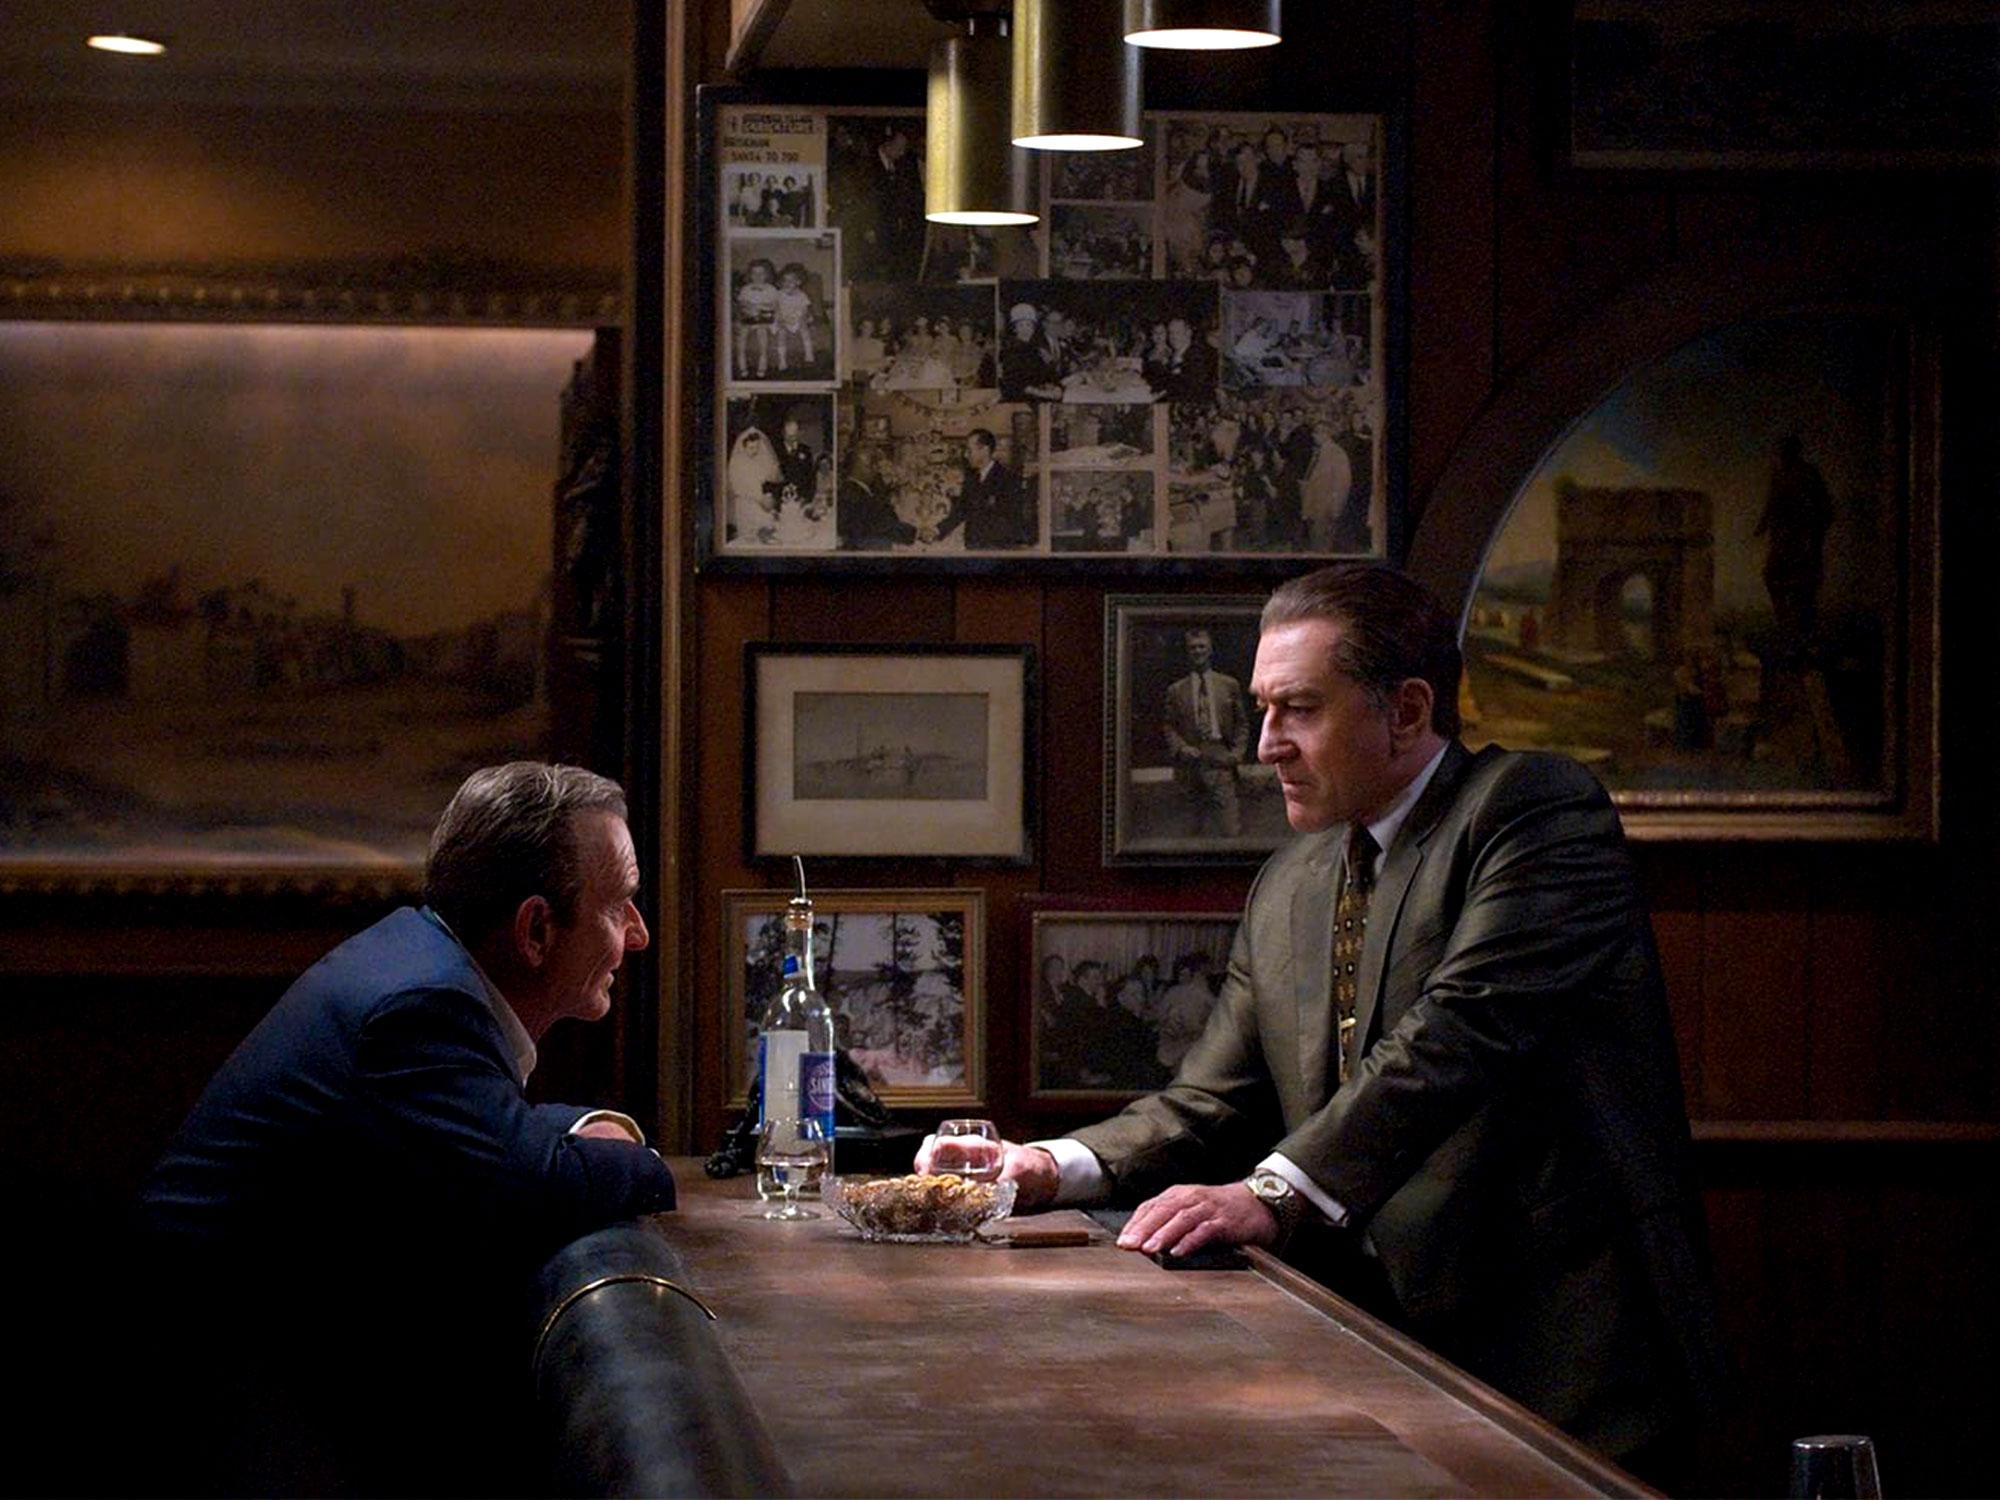 Martin Scorsese's The Irishman to close the 63rd BFI London Film Festival